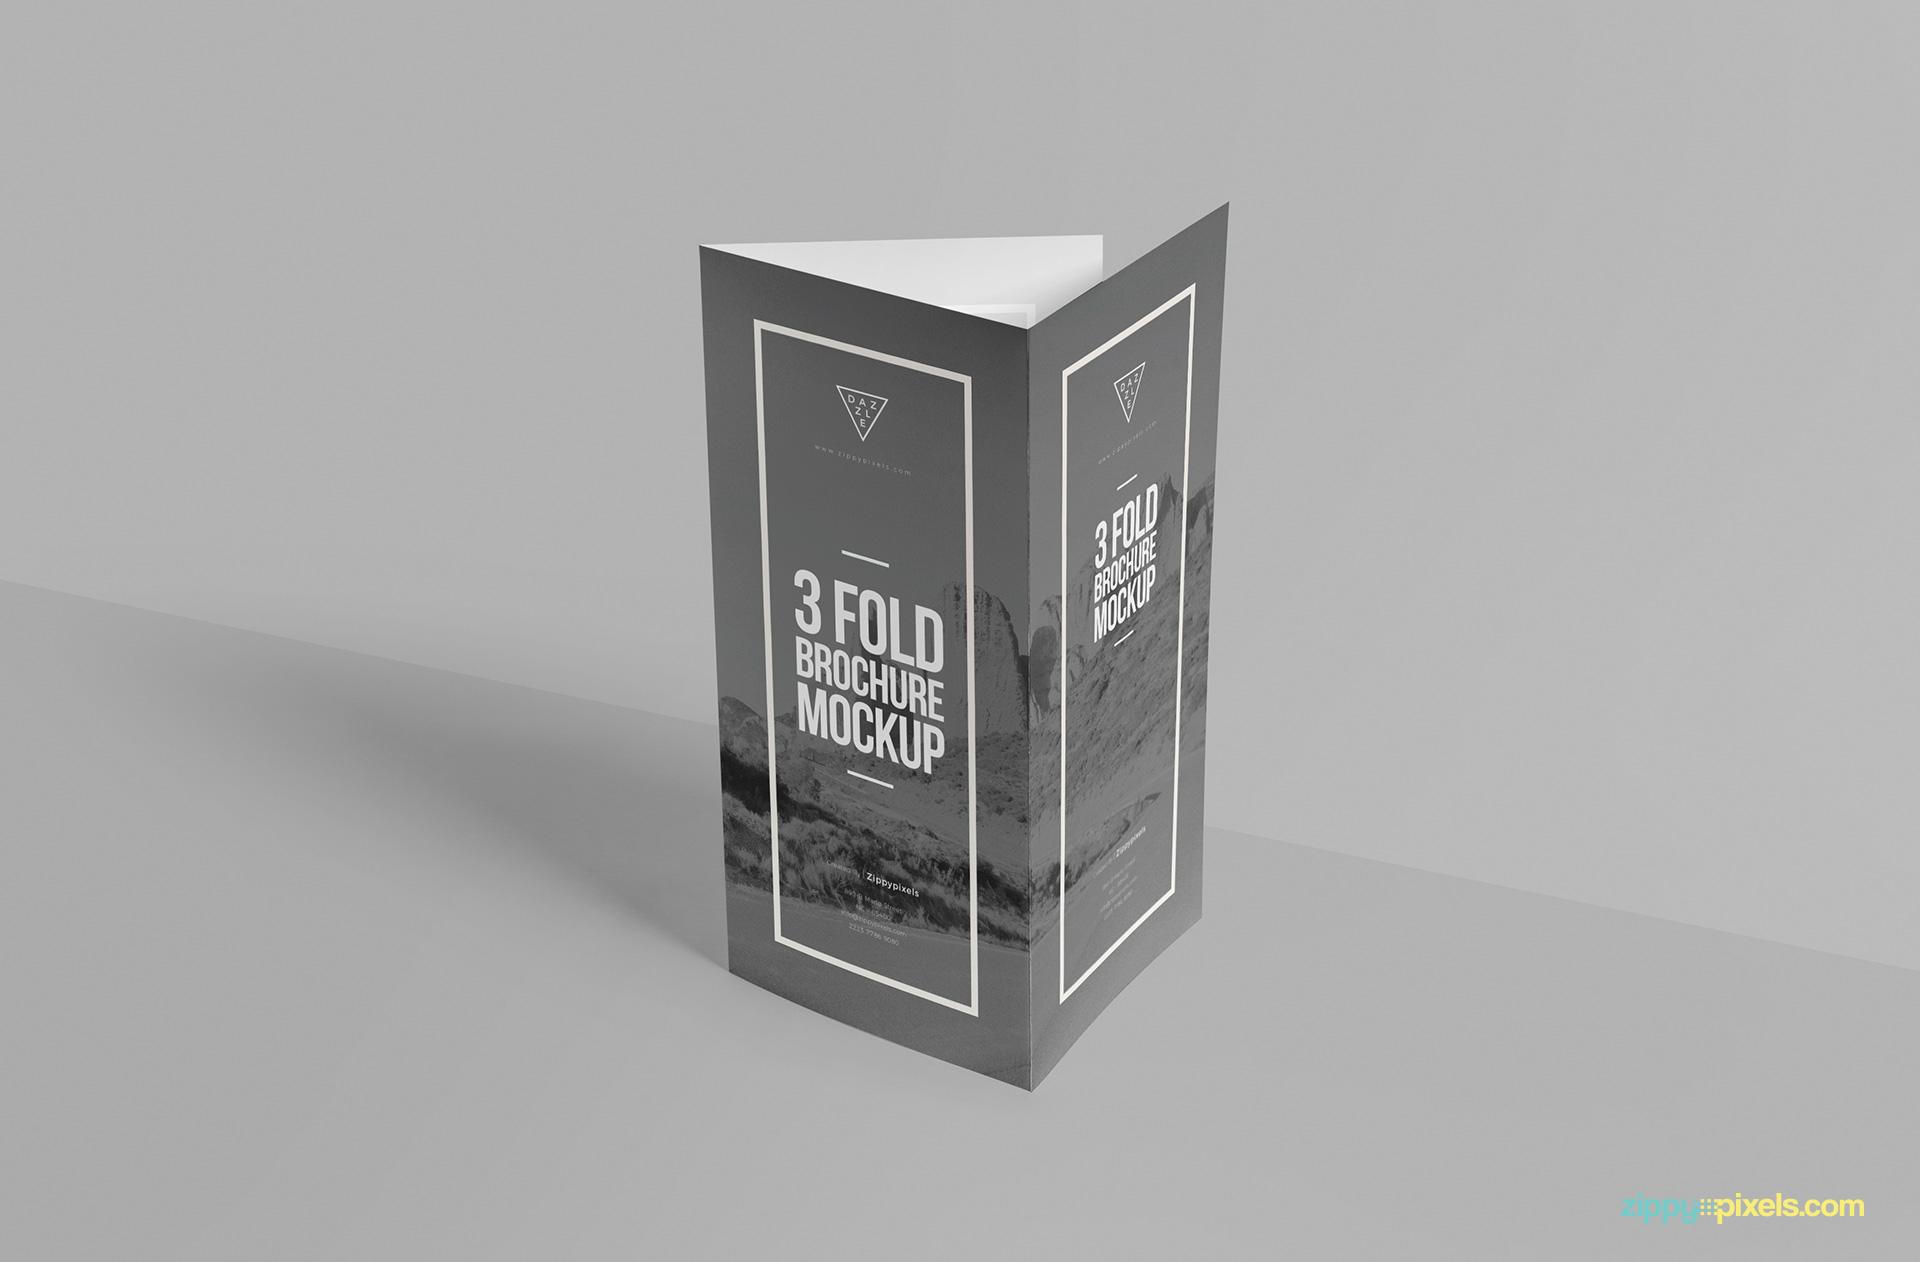 Amazing tri fold brochure mockup.